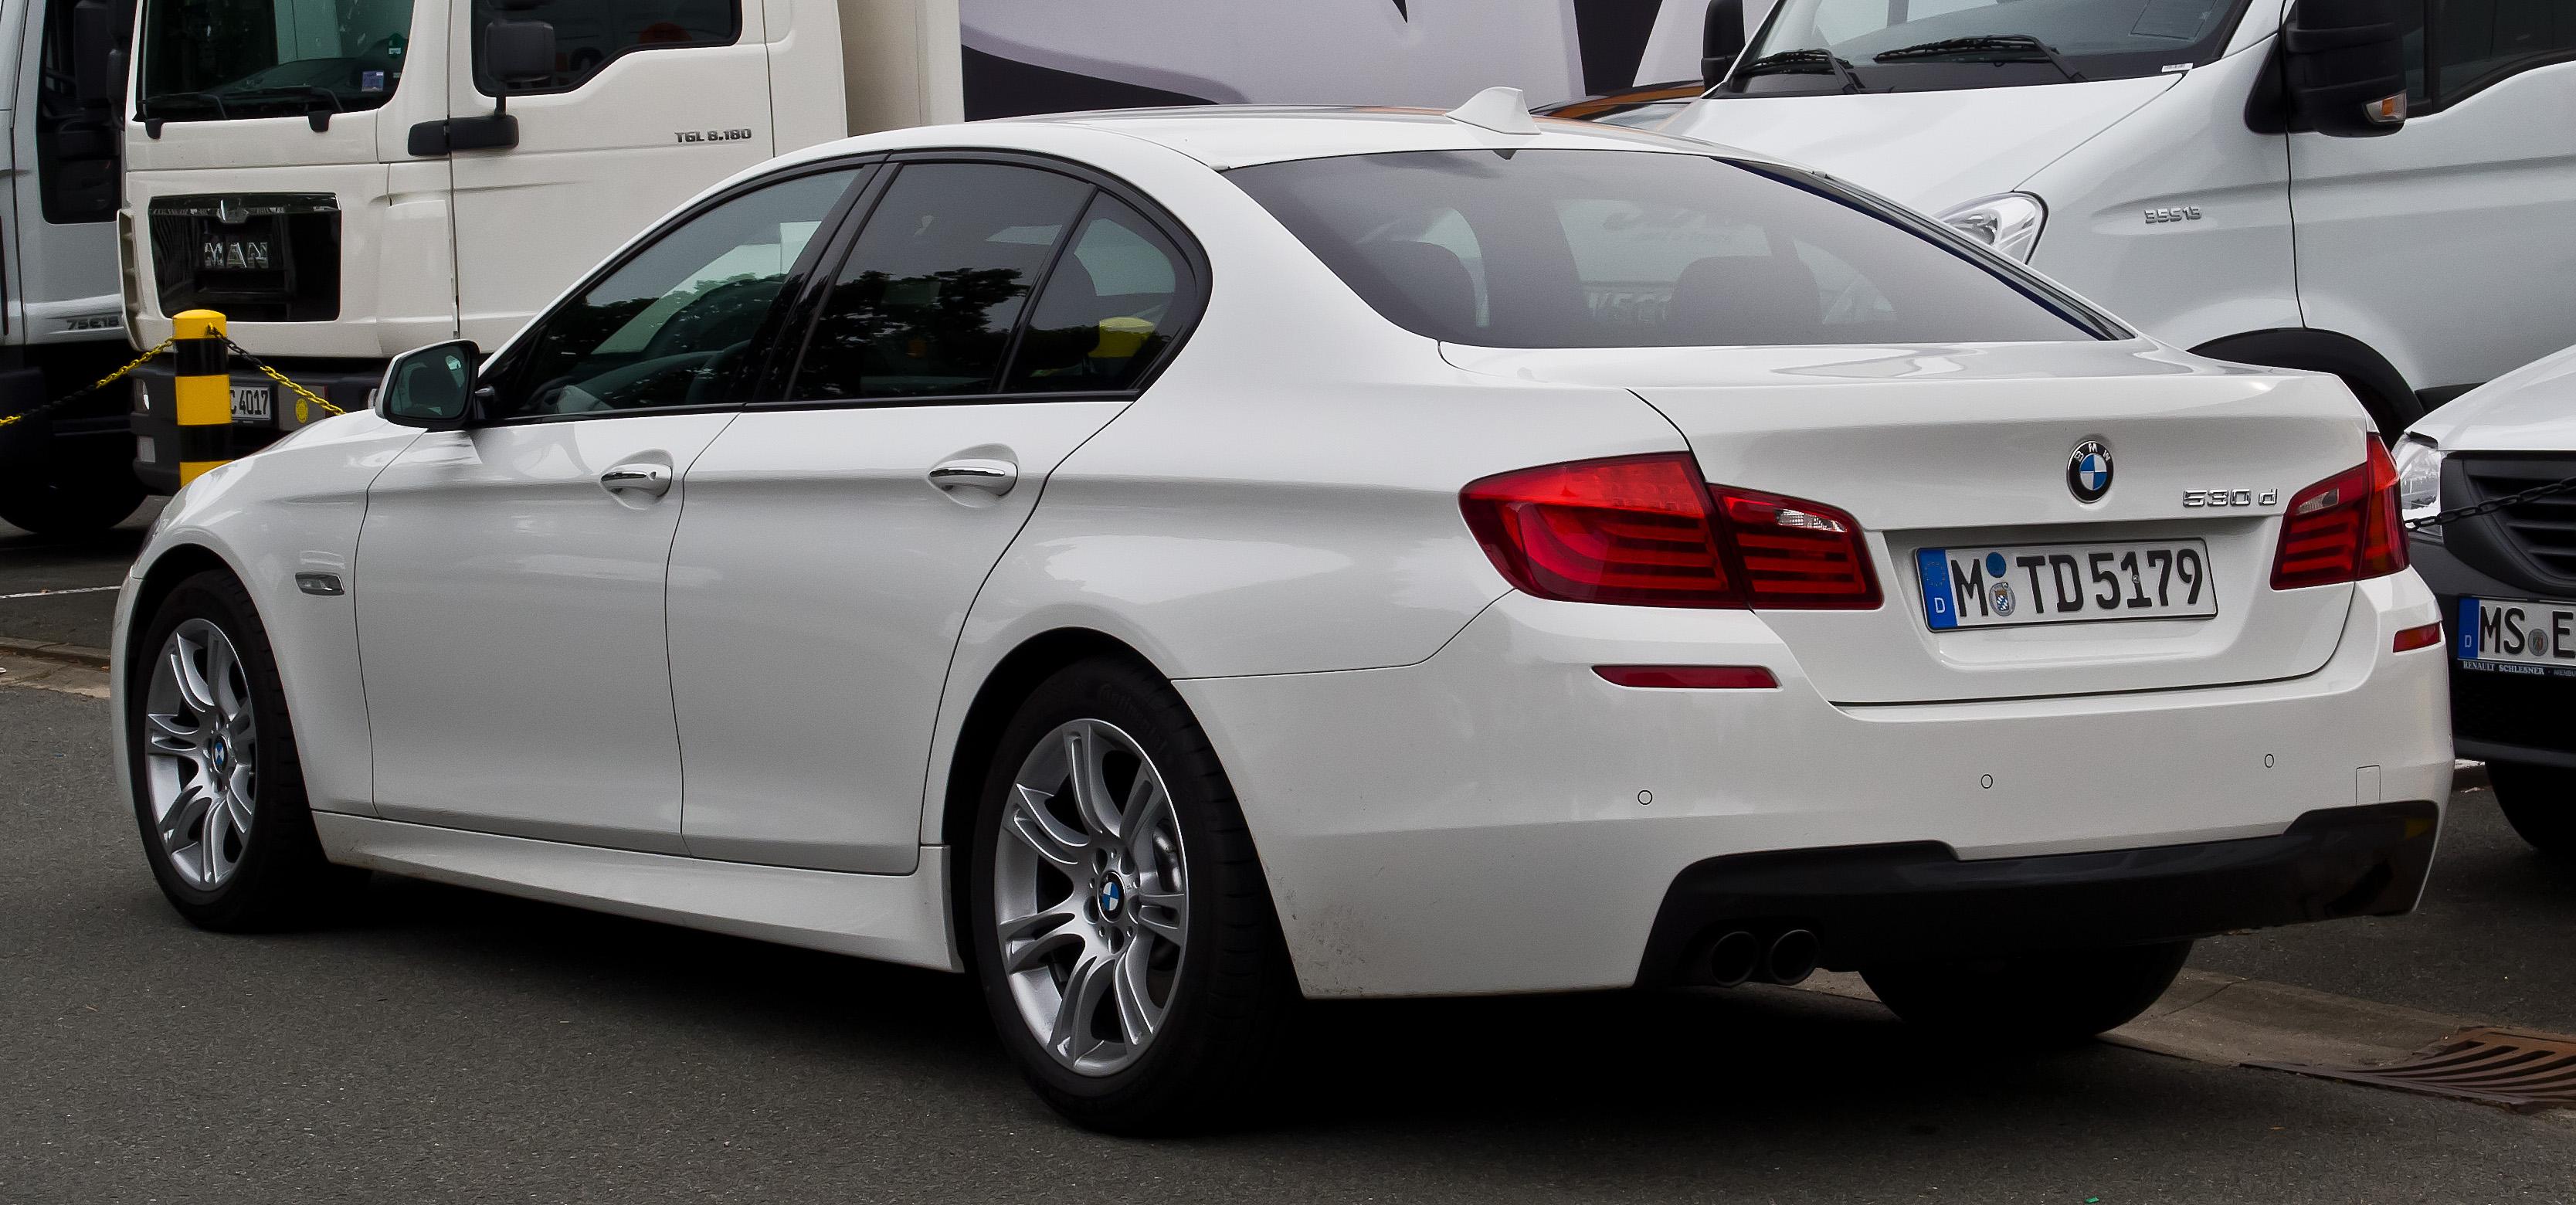 Build A Bmw >> File:BMW 530d M-Sportpaket (F10) – Heckansicht, 1. September 2013, Münster.jpg - Wikimedia Commons